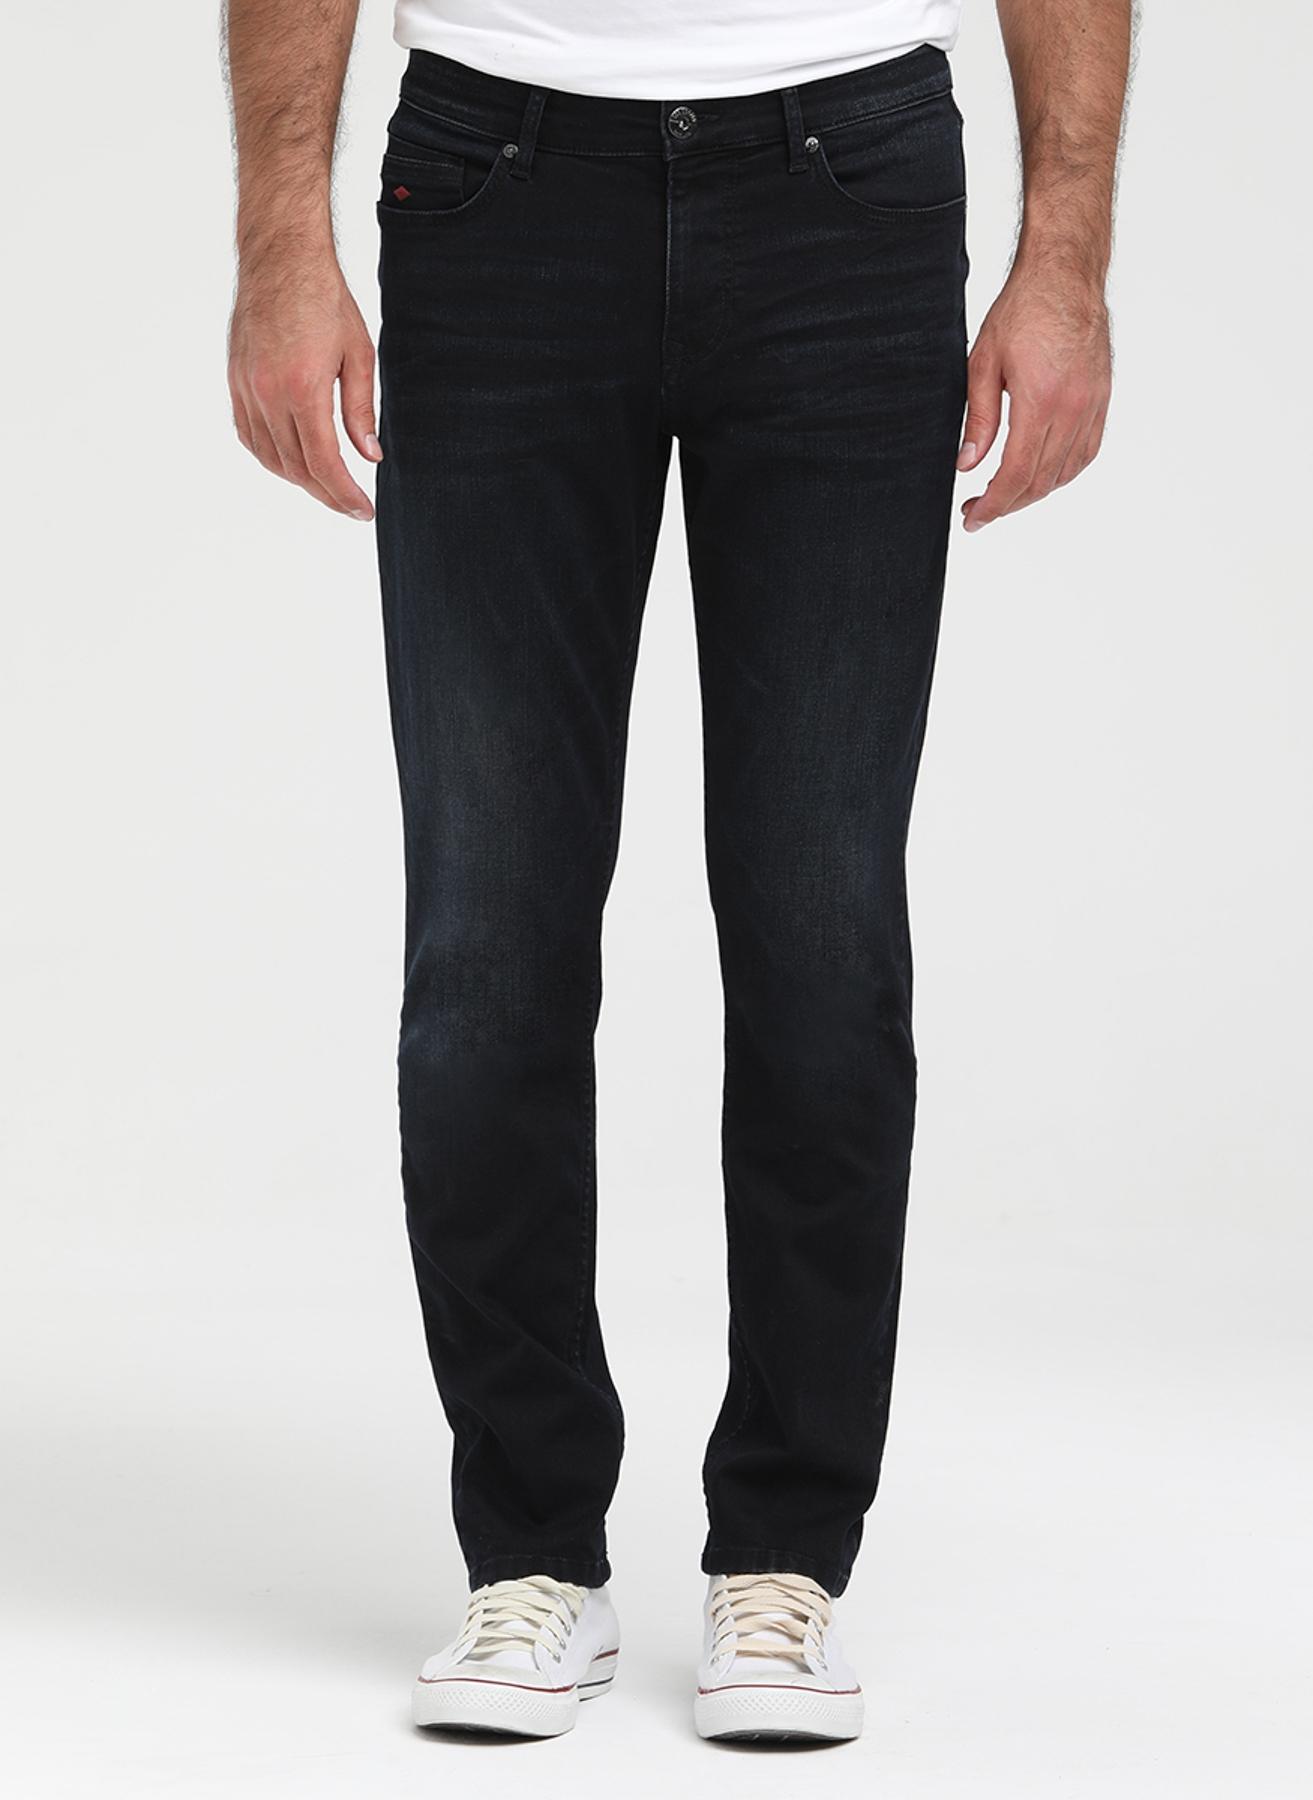 Lee Cooper Jack Klasik Pantolon 33-32 5000200281014 Ürün Resmi